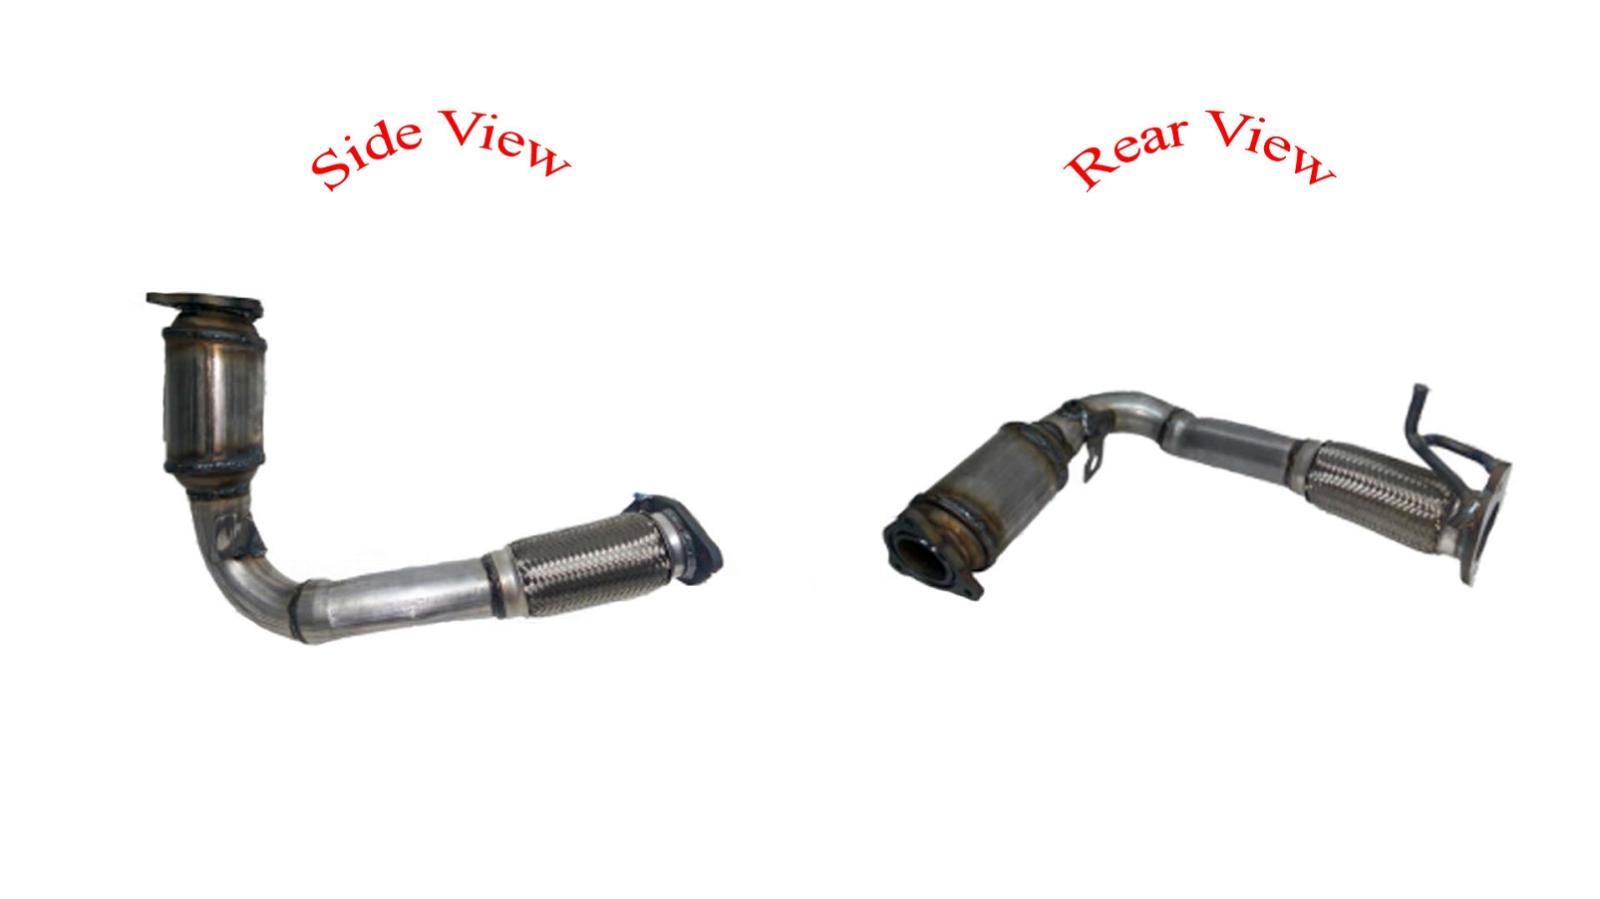 2011 Gmc Terrain Flex Pipe Repair Kit on 2014 Subaru Tribeca Engine